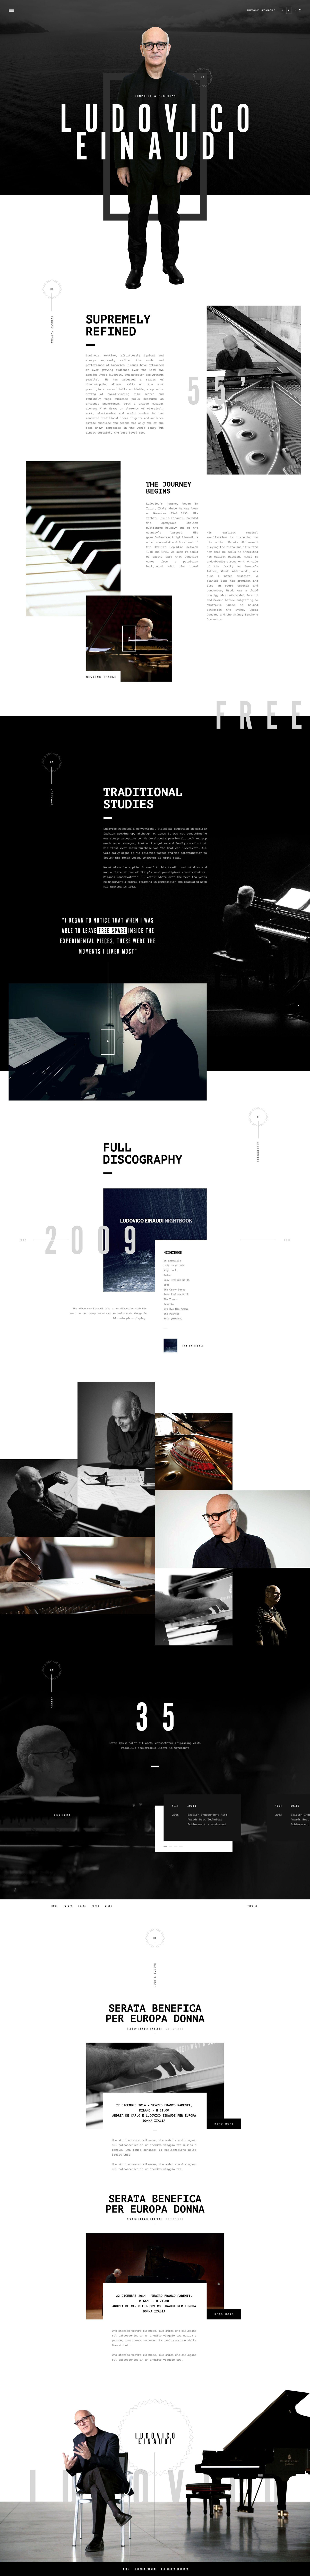 Ludovico Einaudi web presence conceptual design. Ui work by Gene Ross on dribbble.